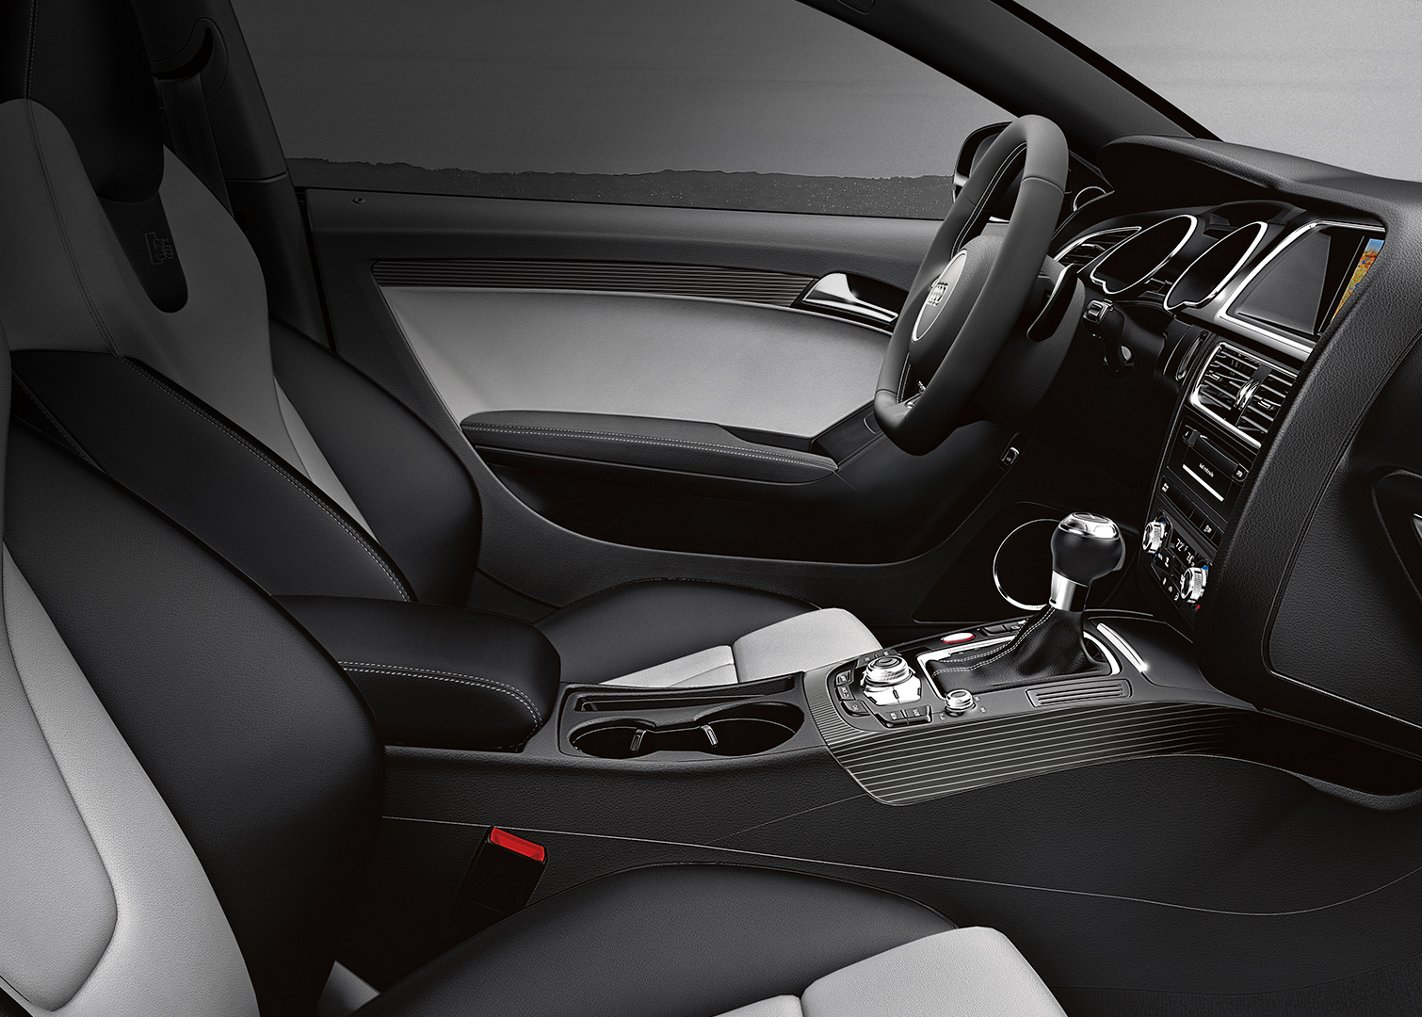 New Audi S5 Interior main image